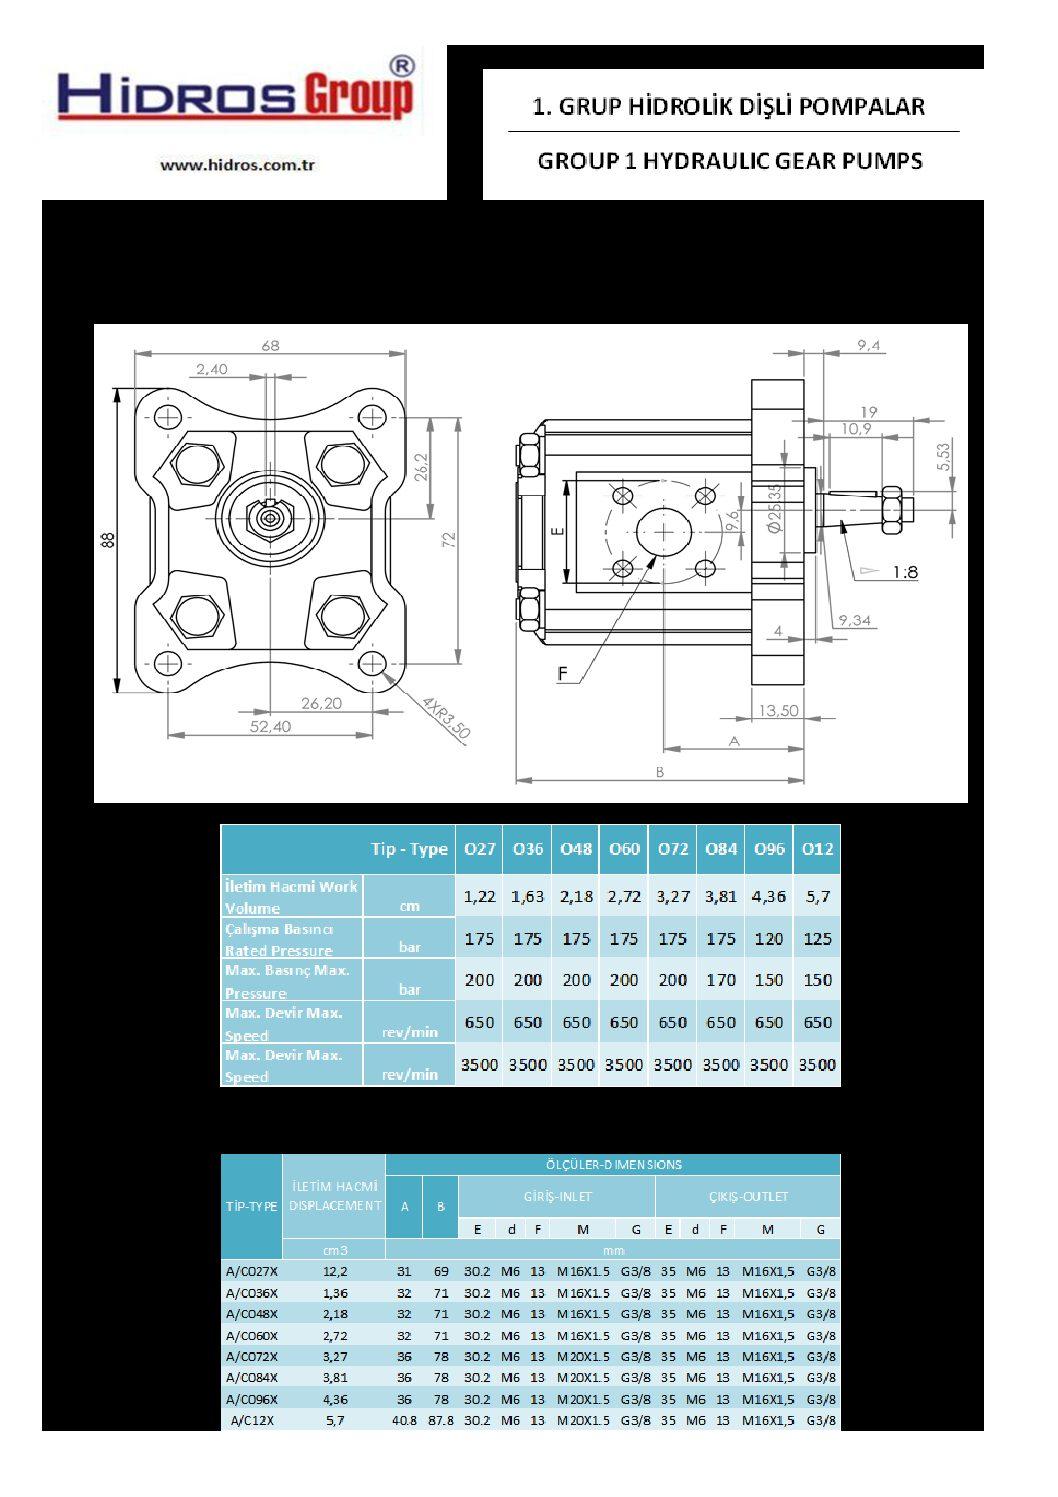 Hammaspyöräpumppu 1 sarja pdf